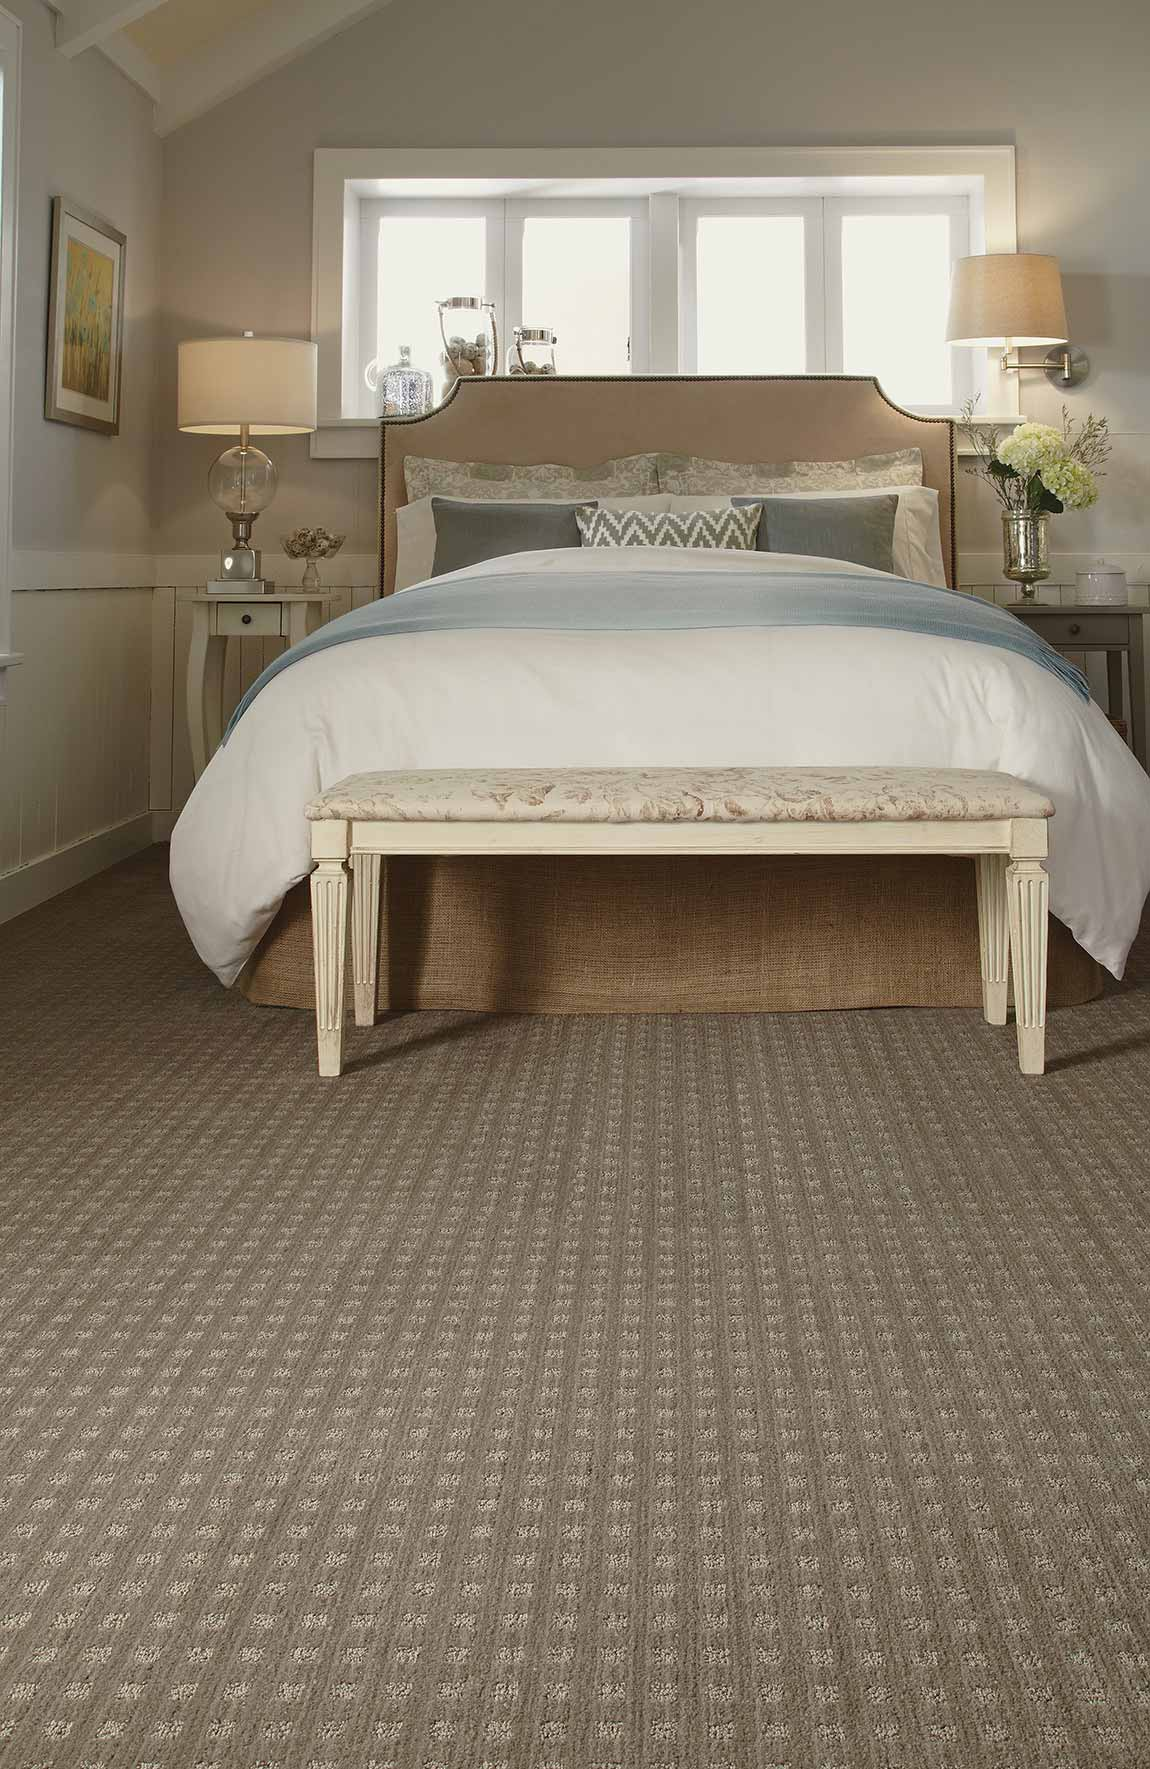 Carpeted Coastal Beach House Bedroom Flooring Designs ...